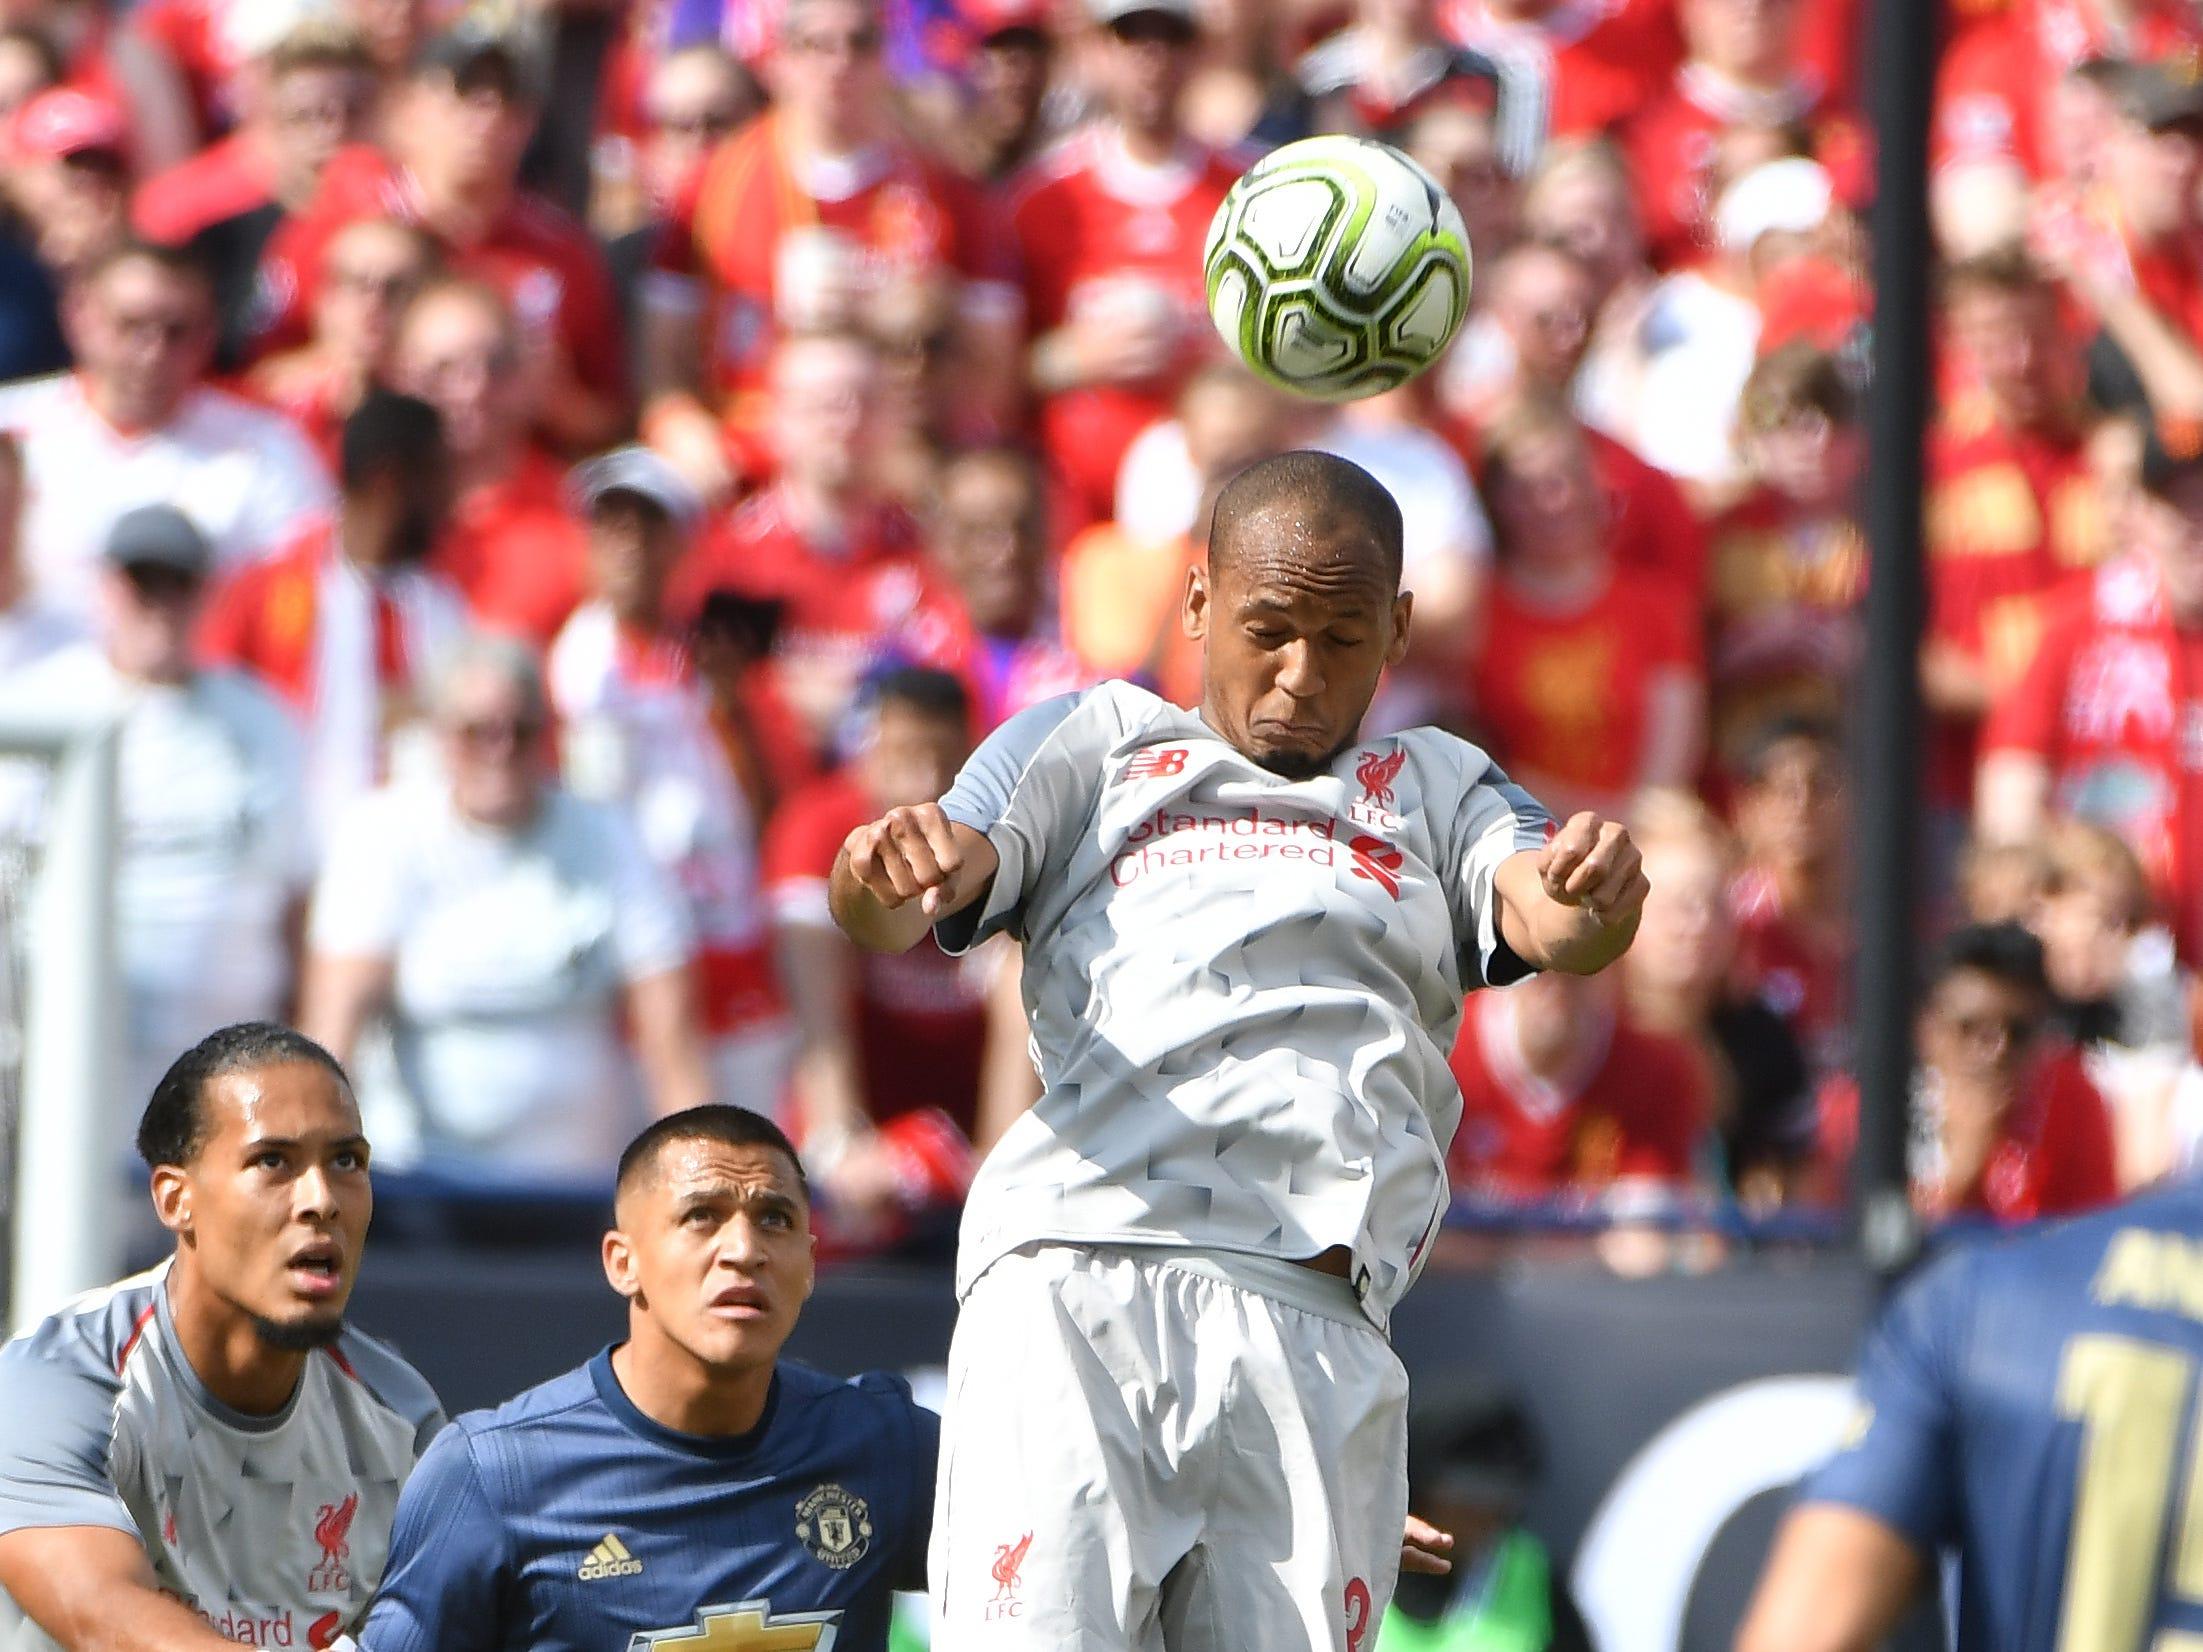 Liverpool's Fabinho heads a goalie kick back up field in the first half.